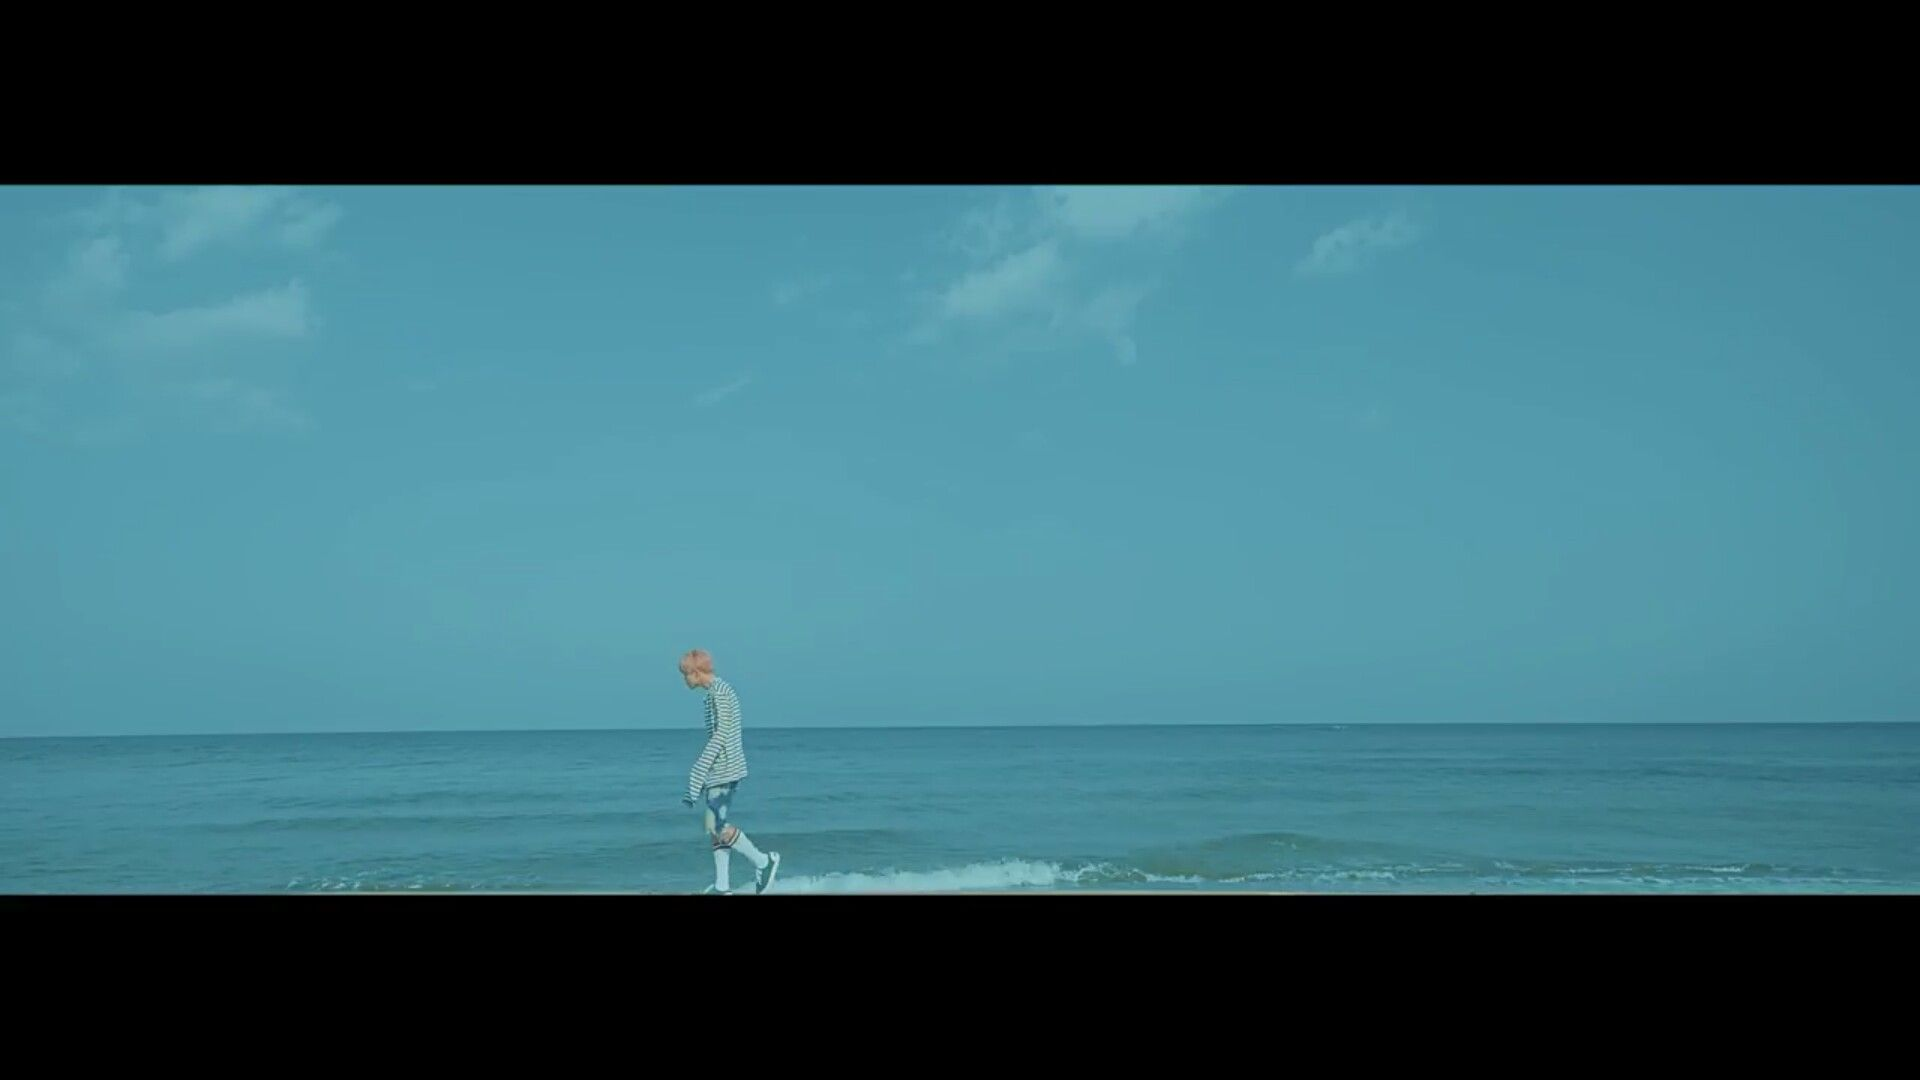 #BTS #YOU_NEVER_WALK_ALONE '봄날 (Spring Day)' MV (https://t.co/EIdsaWH1Fm)  #봄날 #SpringDay